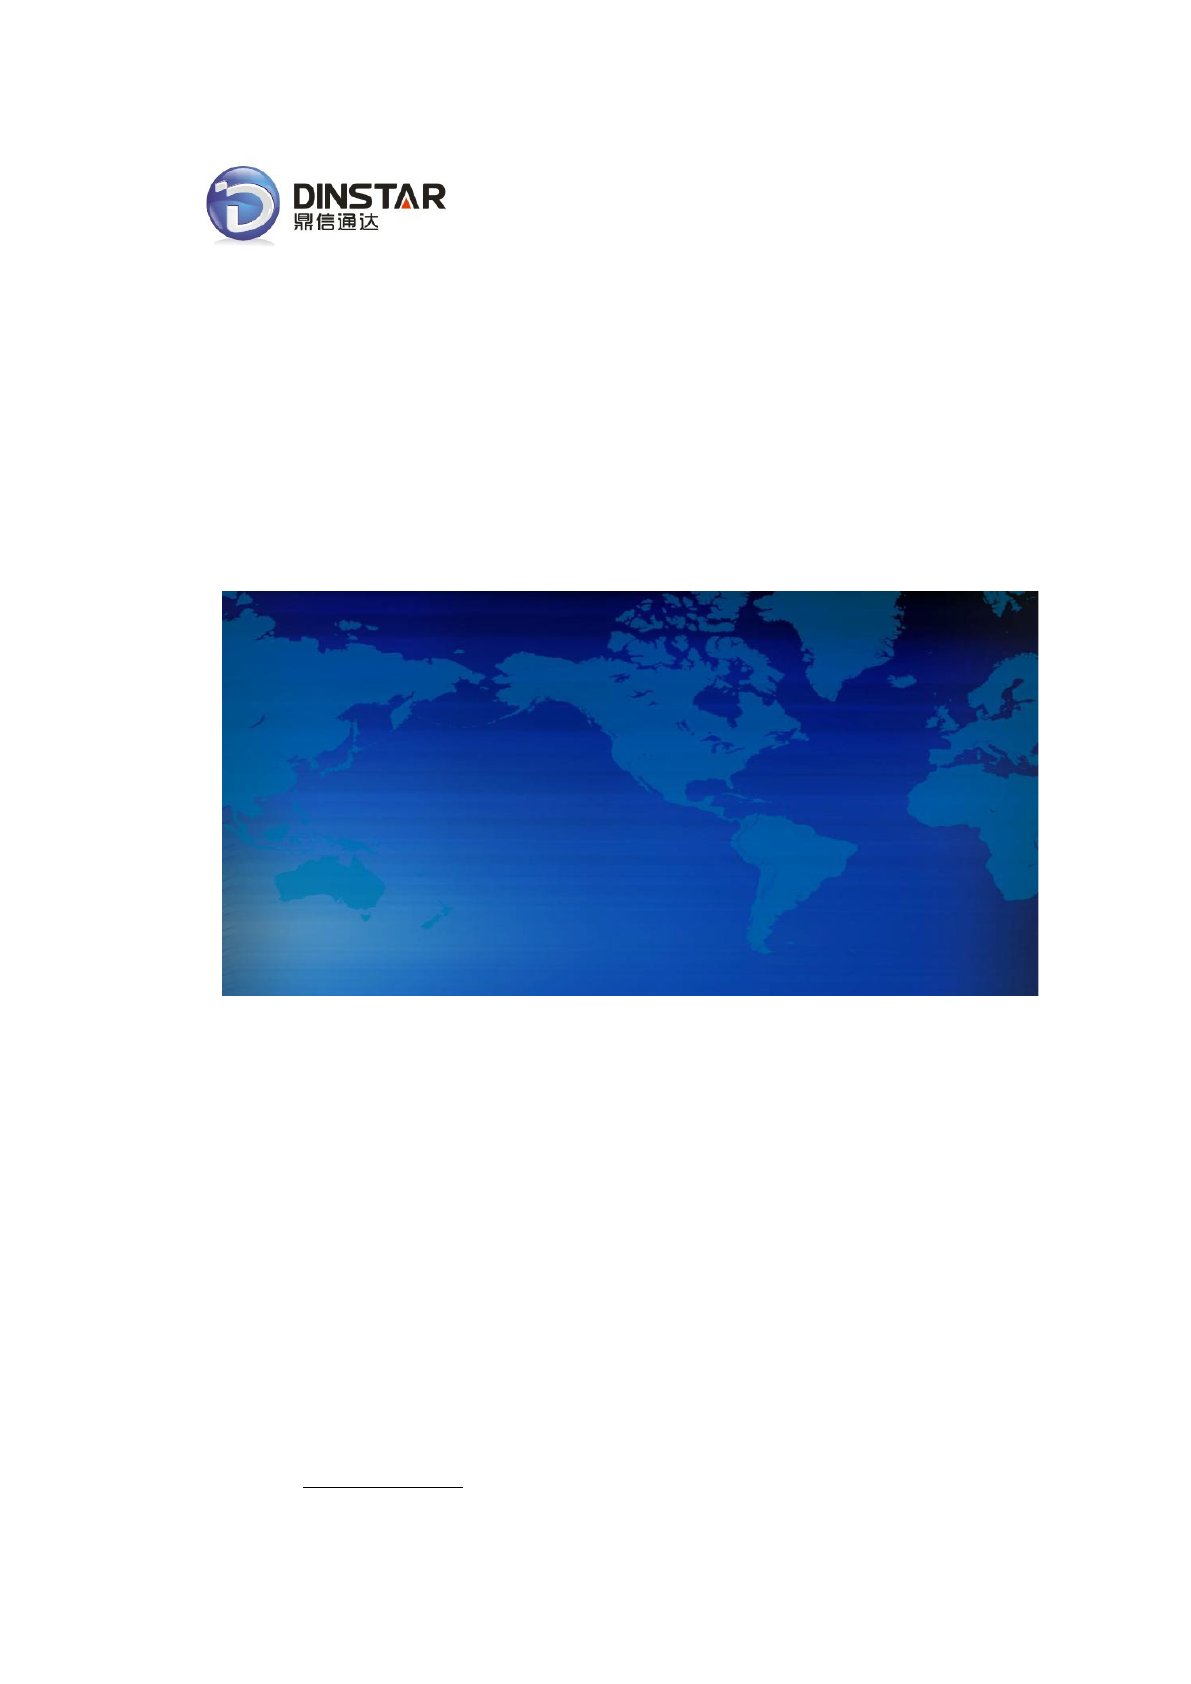 Alinea Banc Génial Uc2000ve Voip Gateway User Manual Dwg Series Gsm Cdma Voip Of 39 Génial Alinea Banc